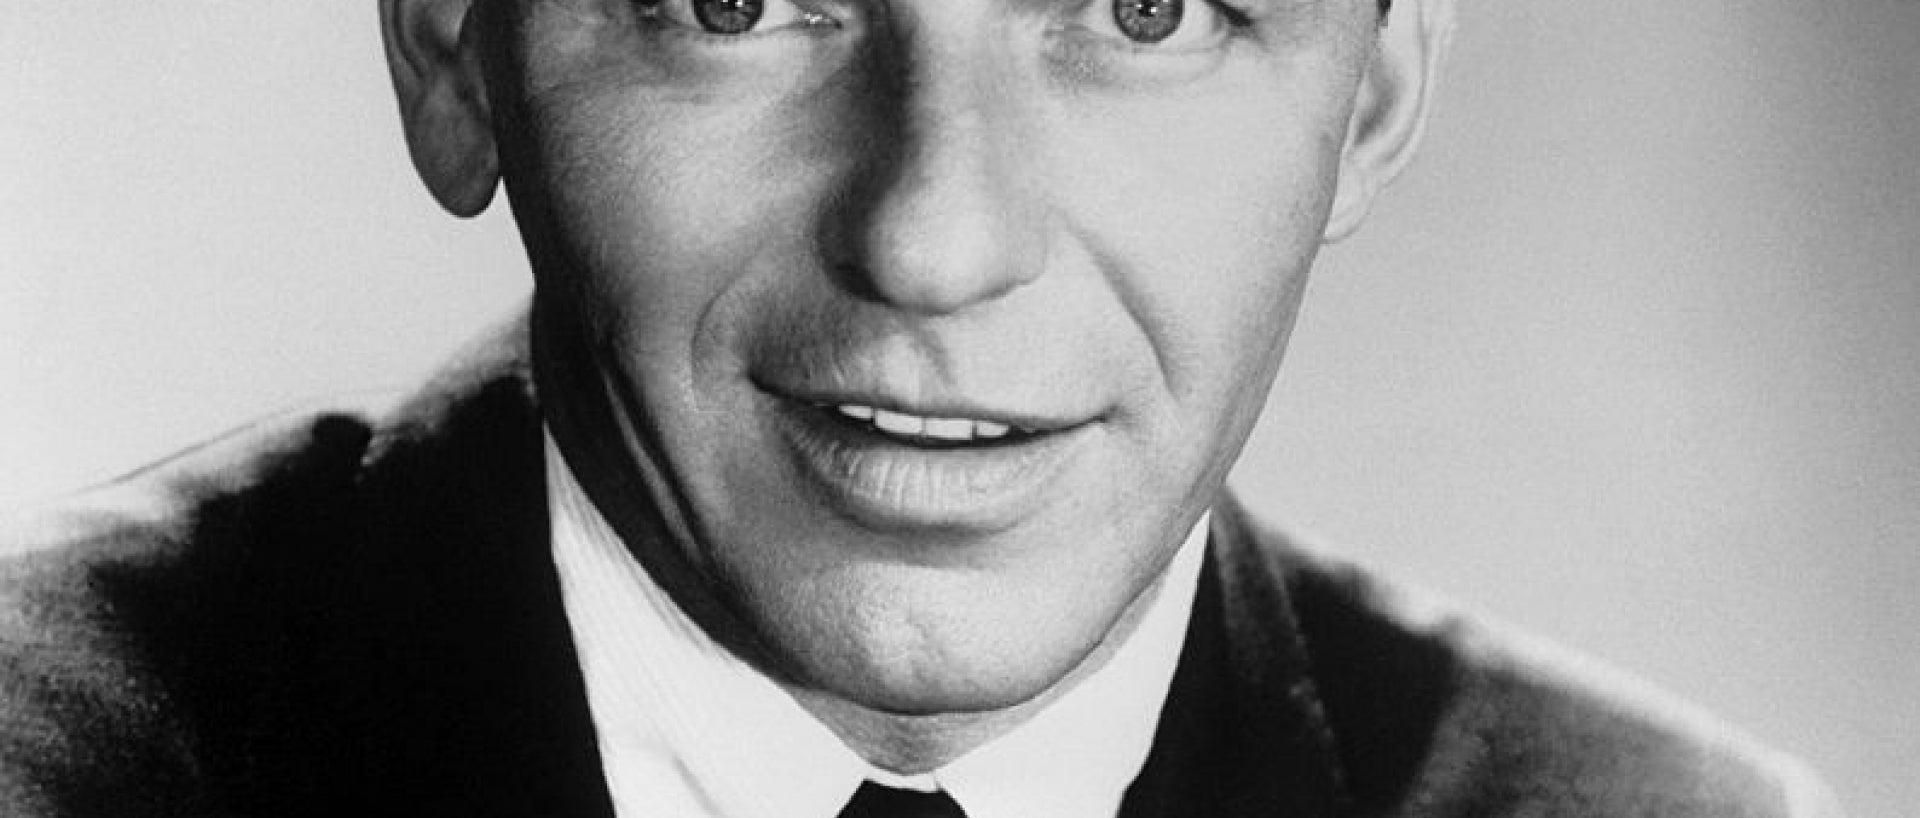 Black and white photo of Frank Sinatra